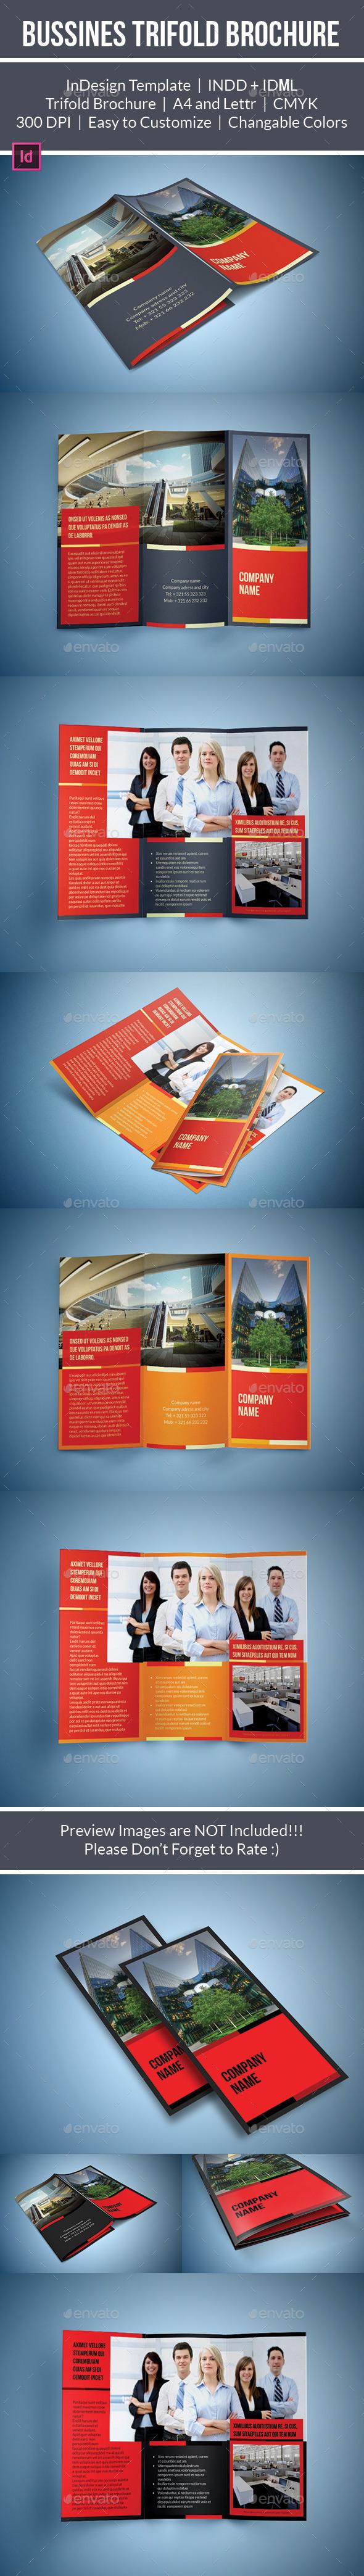 Bussines Tri Fold Brochure Template - Brochures Print Templates